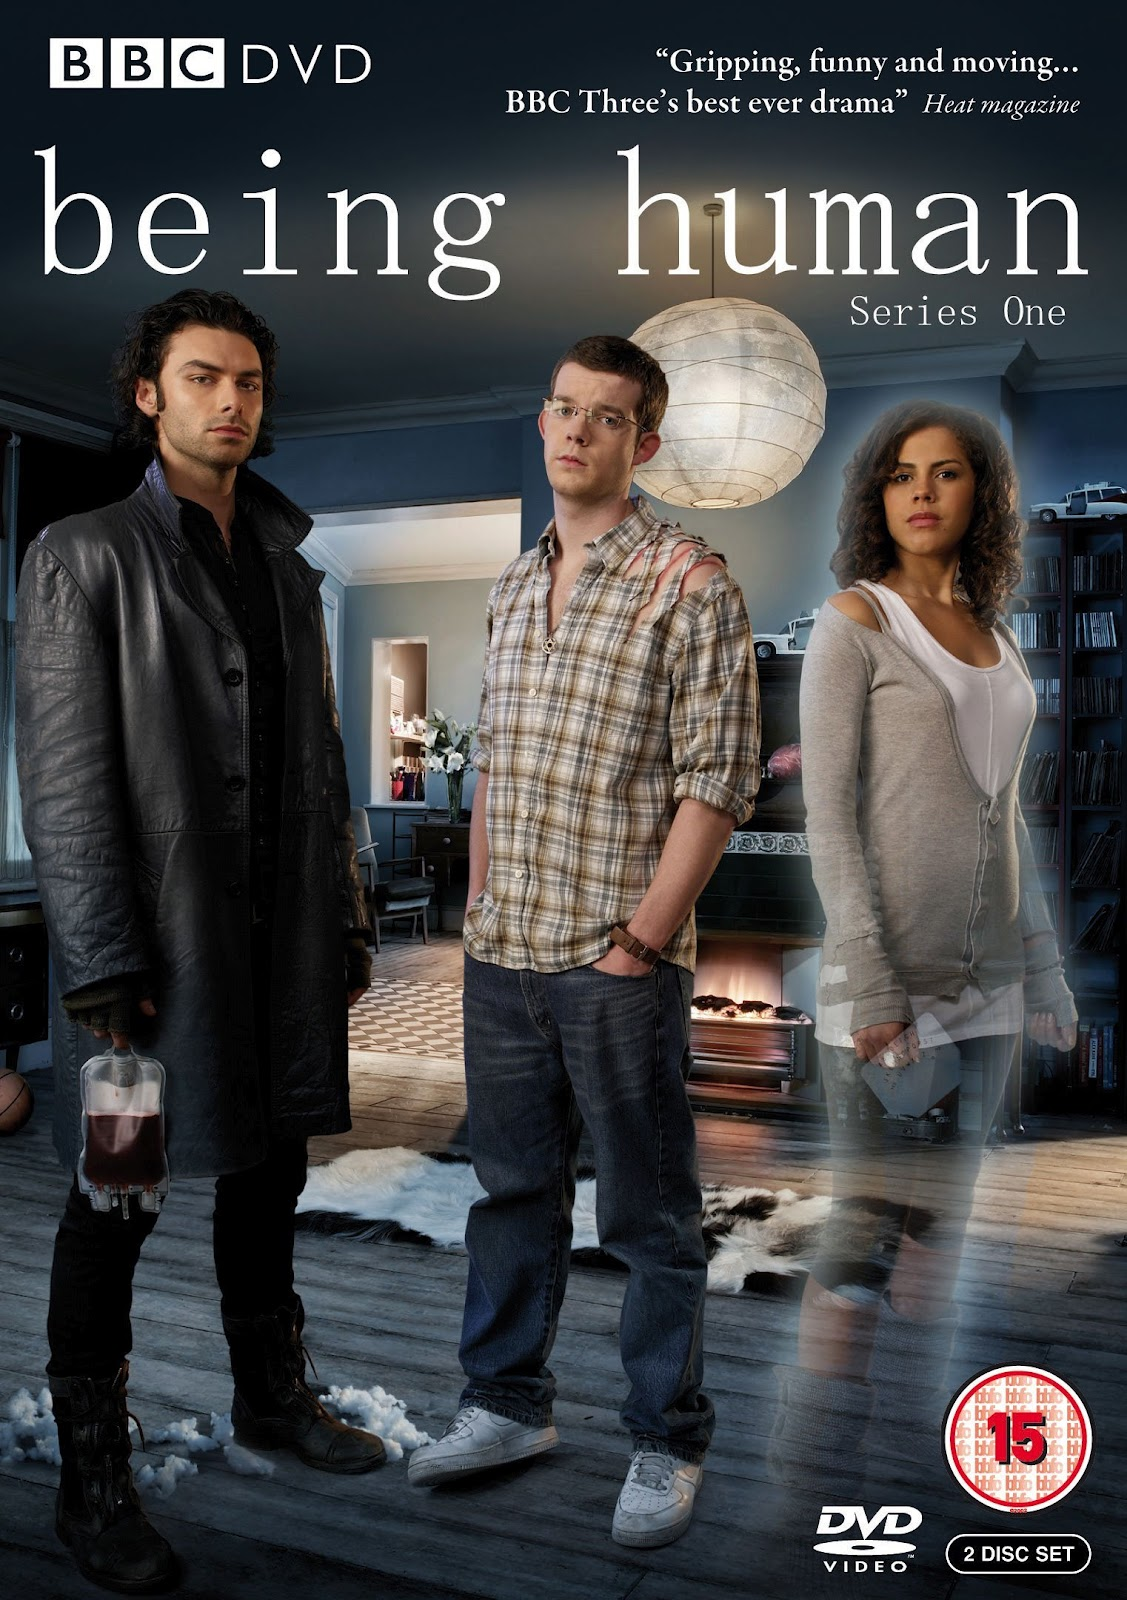 Being Human Season 1 DVD Cover